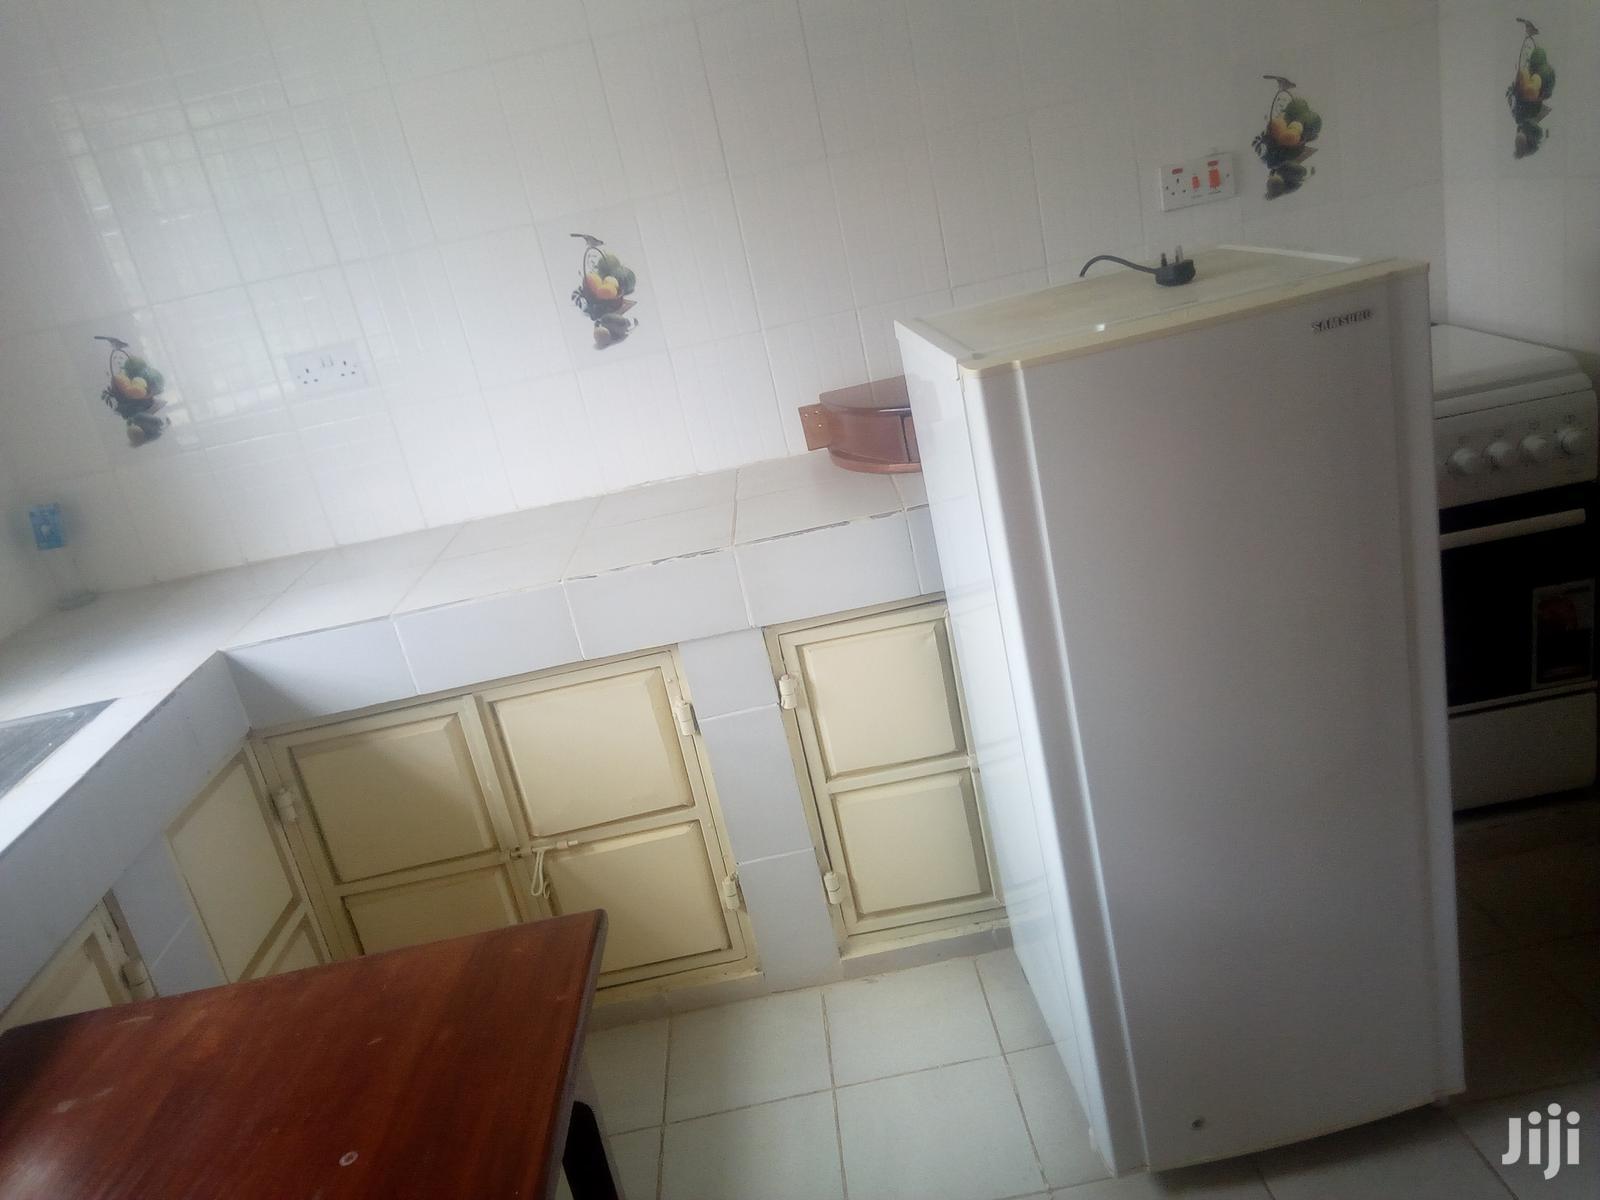 3bdrm Apartment in Ongata Rongai for Rent | Houses & Apartments For Rent for sale in Ongata Rongai, Kajiado, Kenya